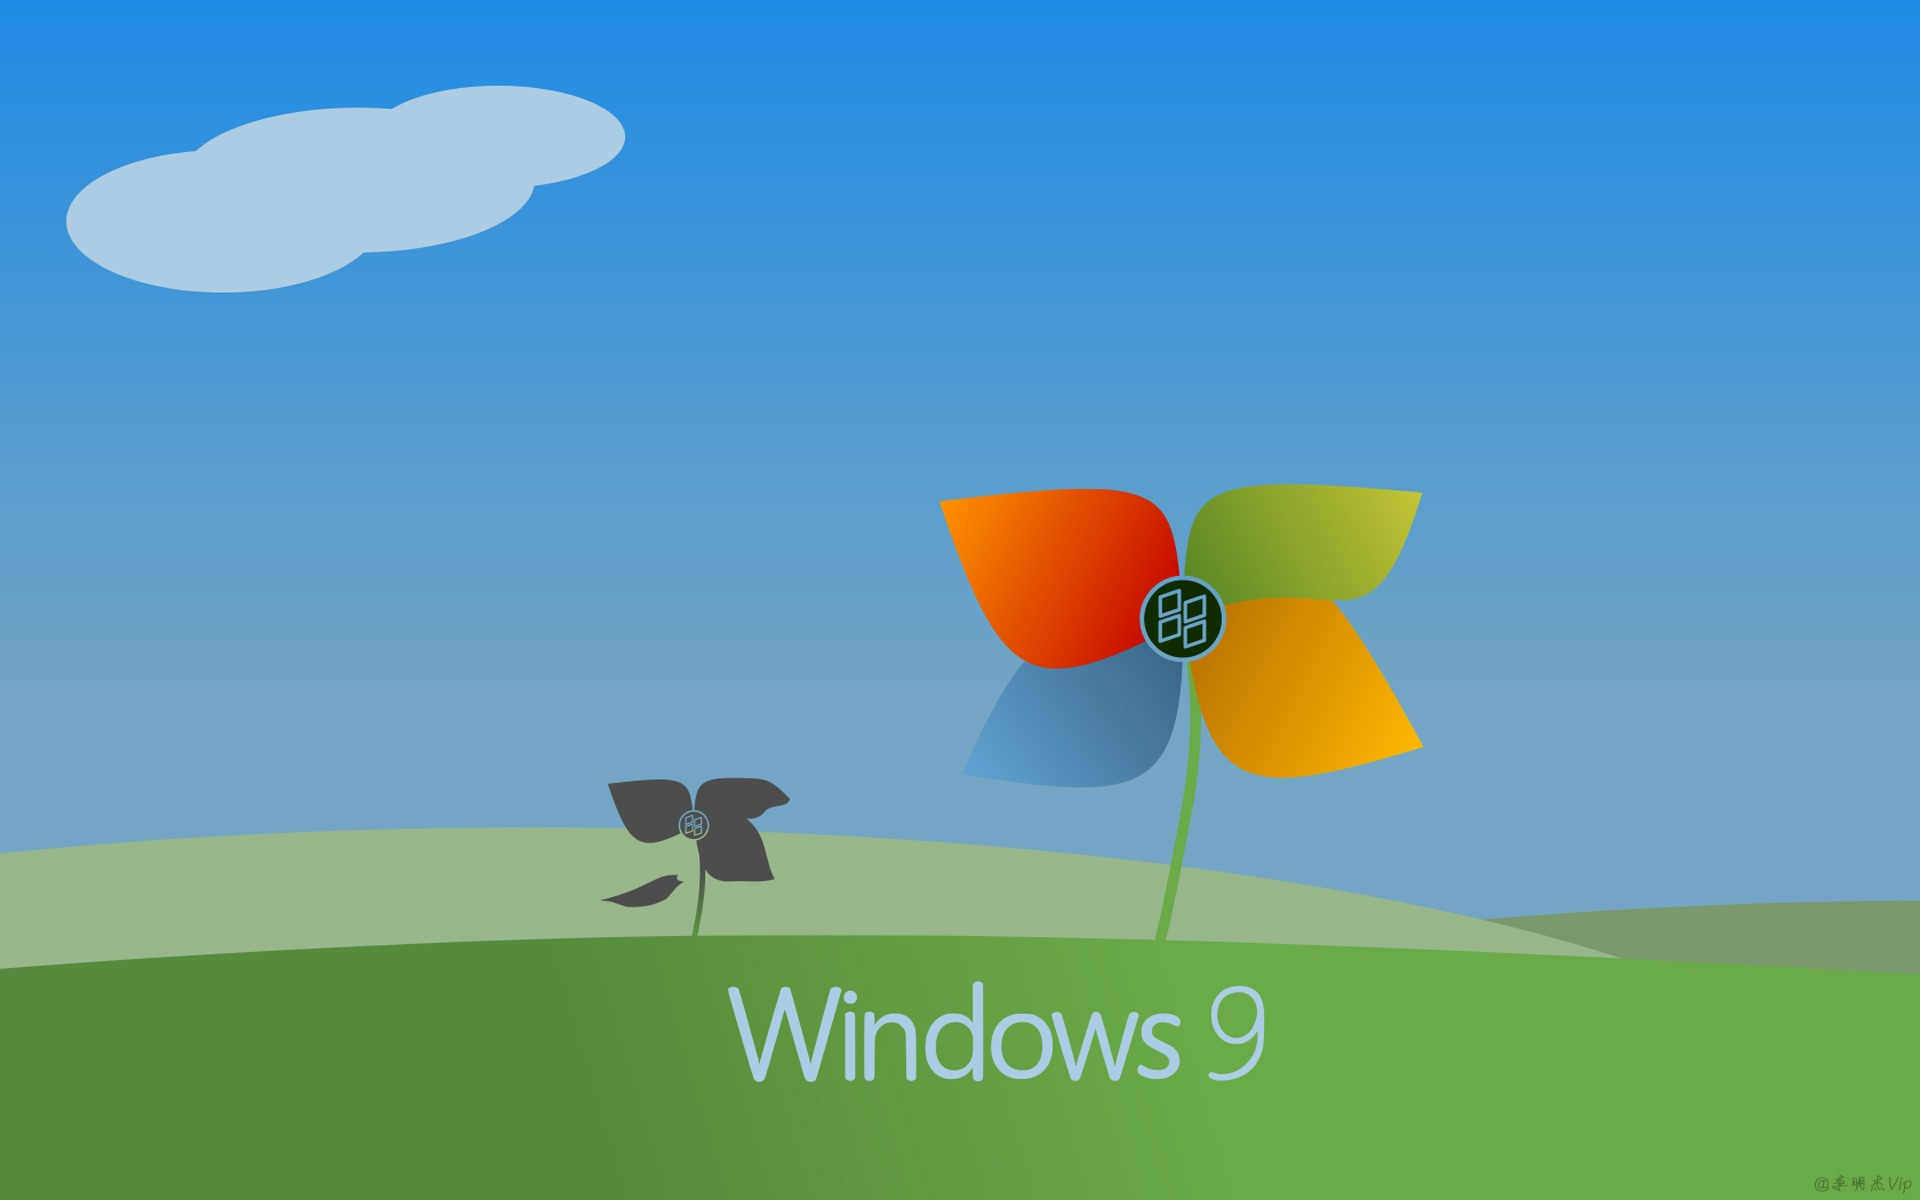 windows 9 full - photo #22